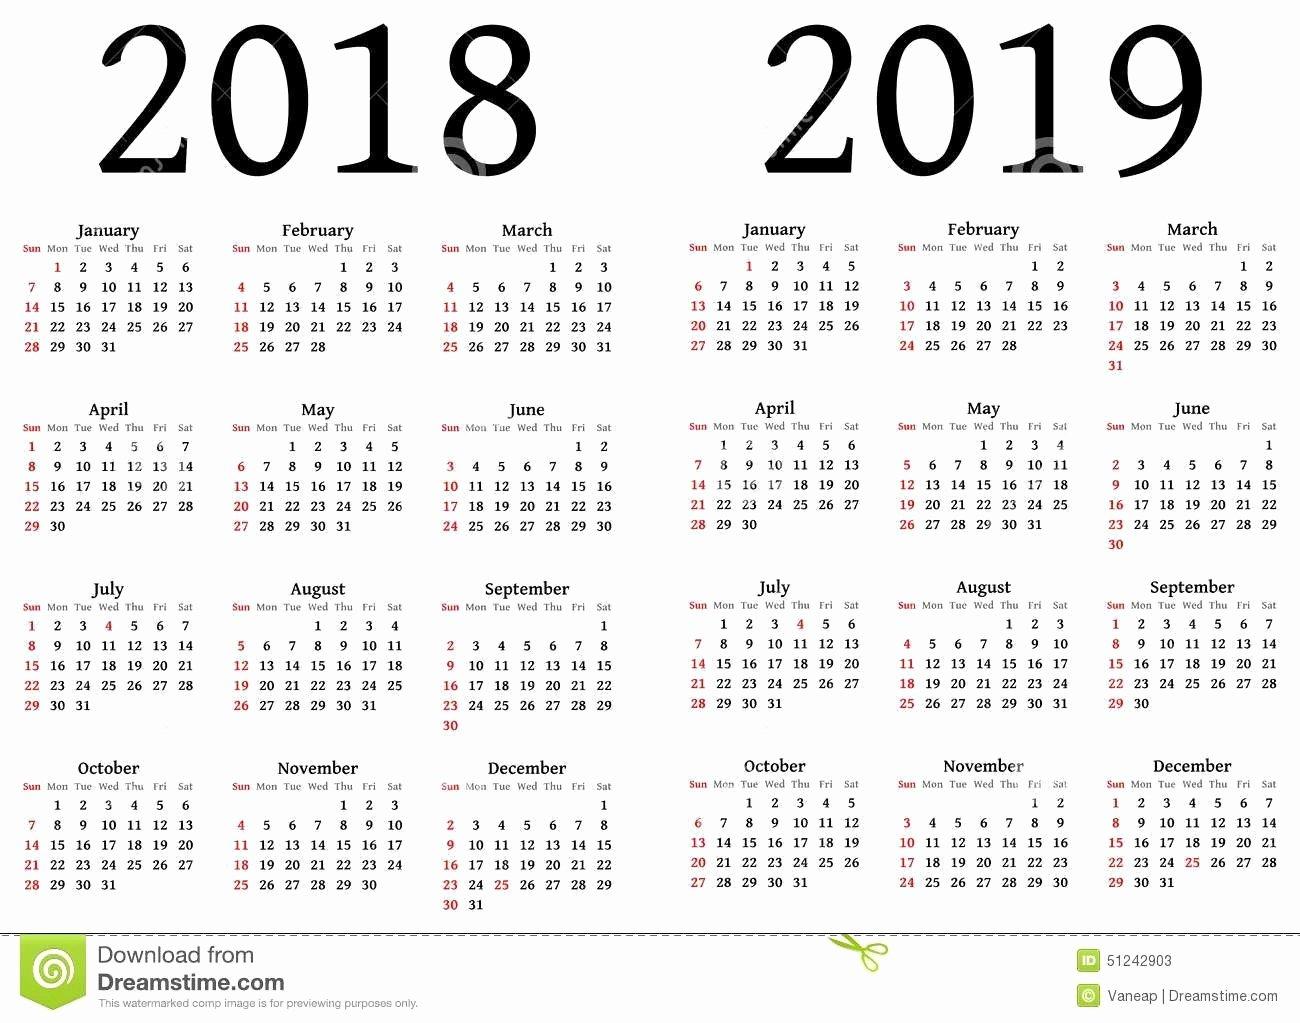 Biweekly Payroll Calendar Template 2019 Unique Biweekly Payroll Calendar Template 2019